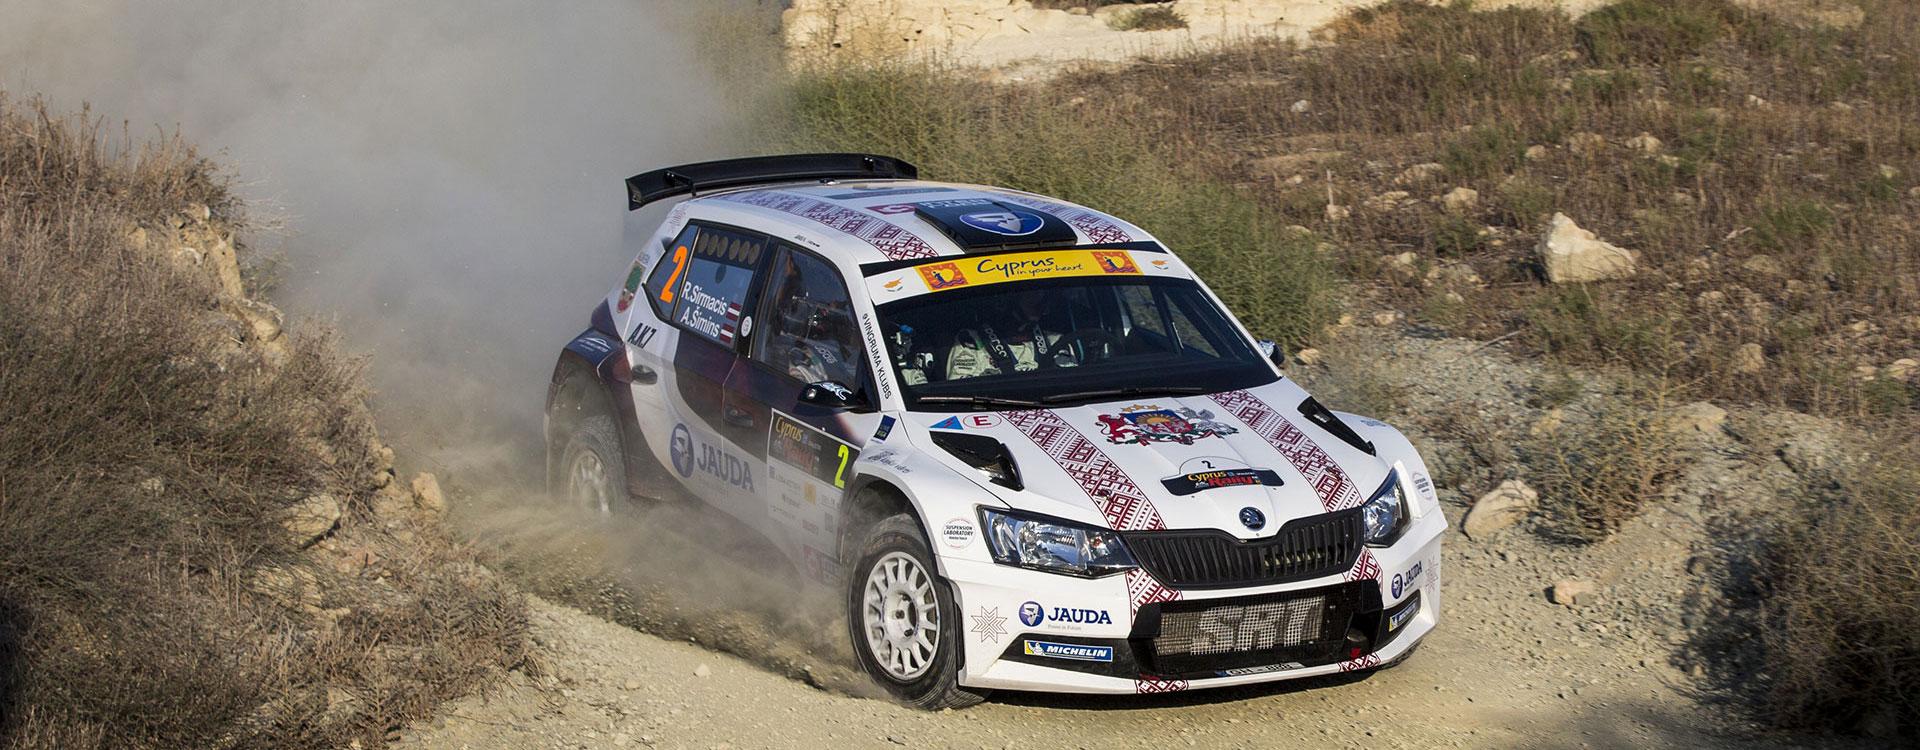 PHOTO: ŠKODA Customer Teams at the Cyprus Rally 2016